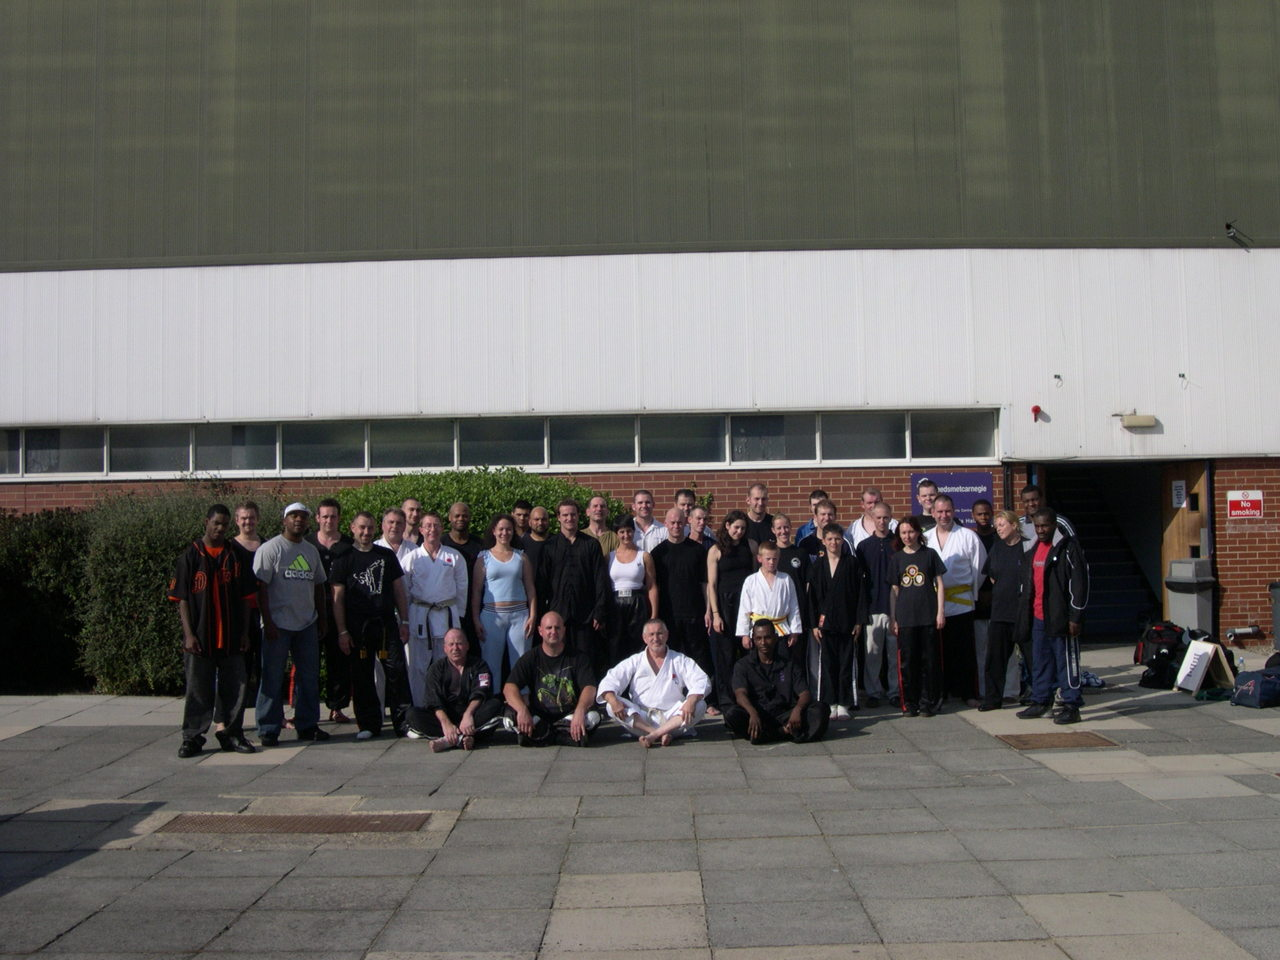 Seminar+Carnige+Leeds05+067.jpg